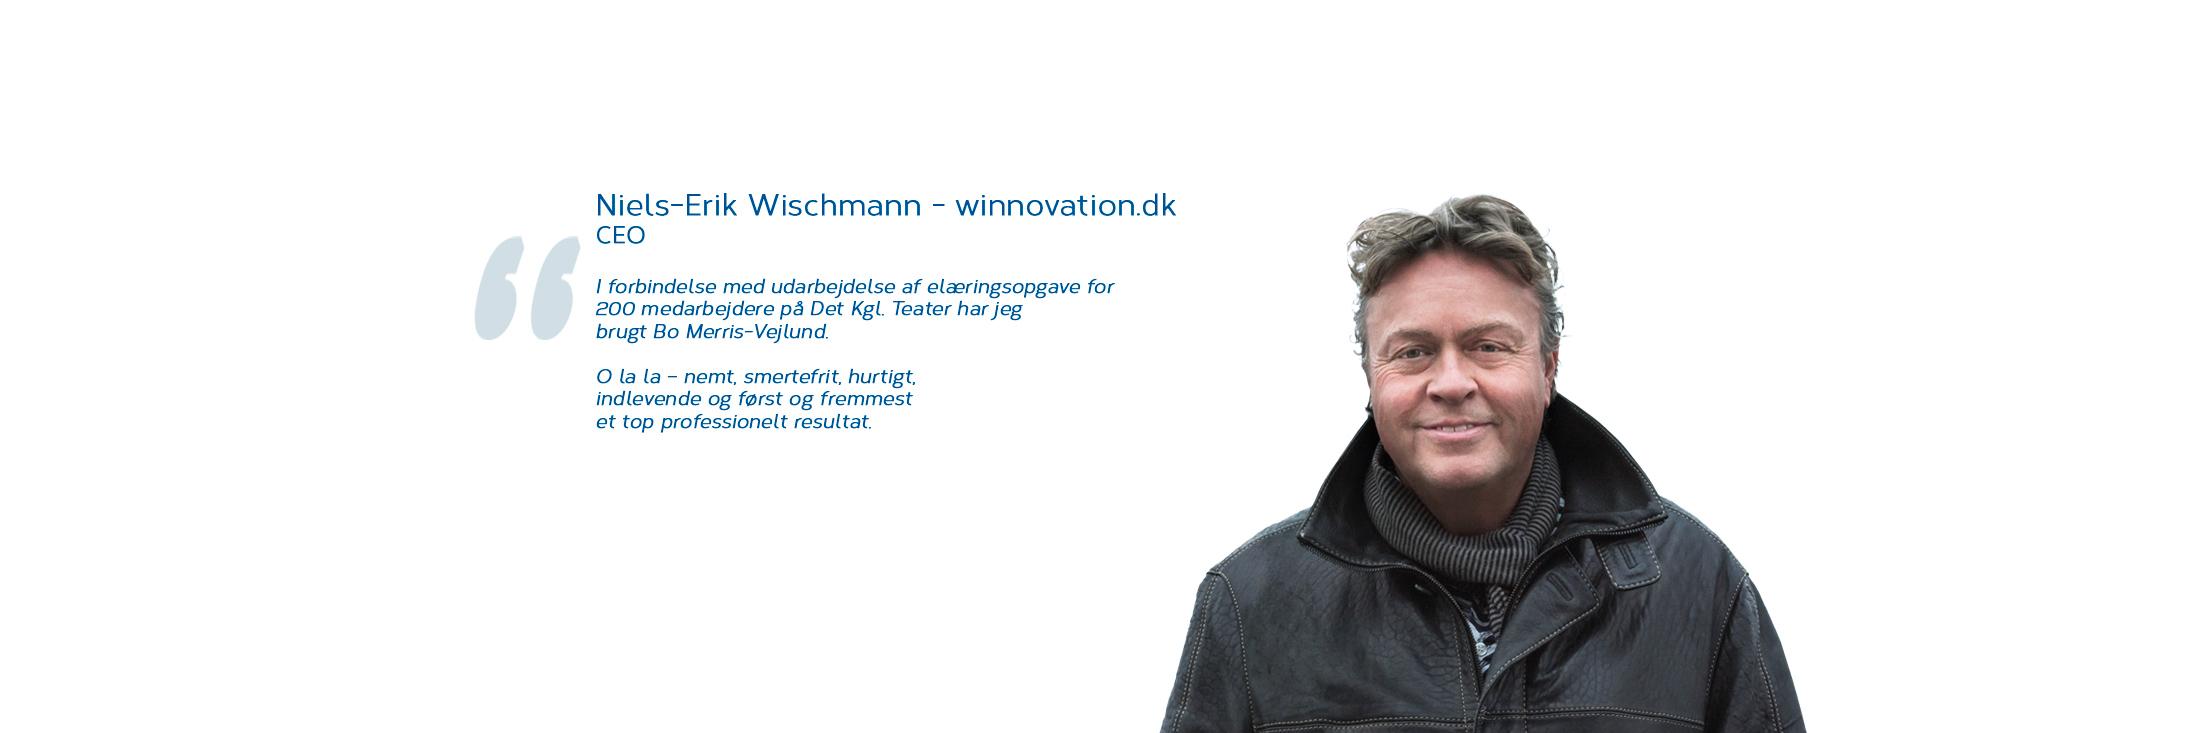 Niels-Erik Wischmann